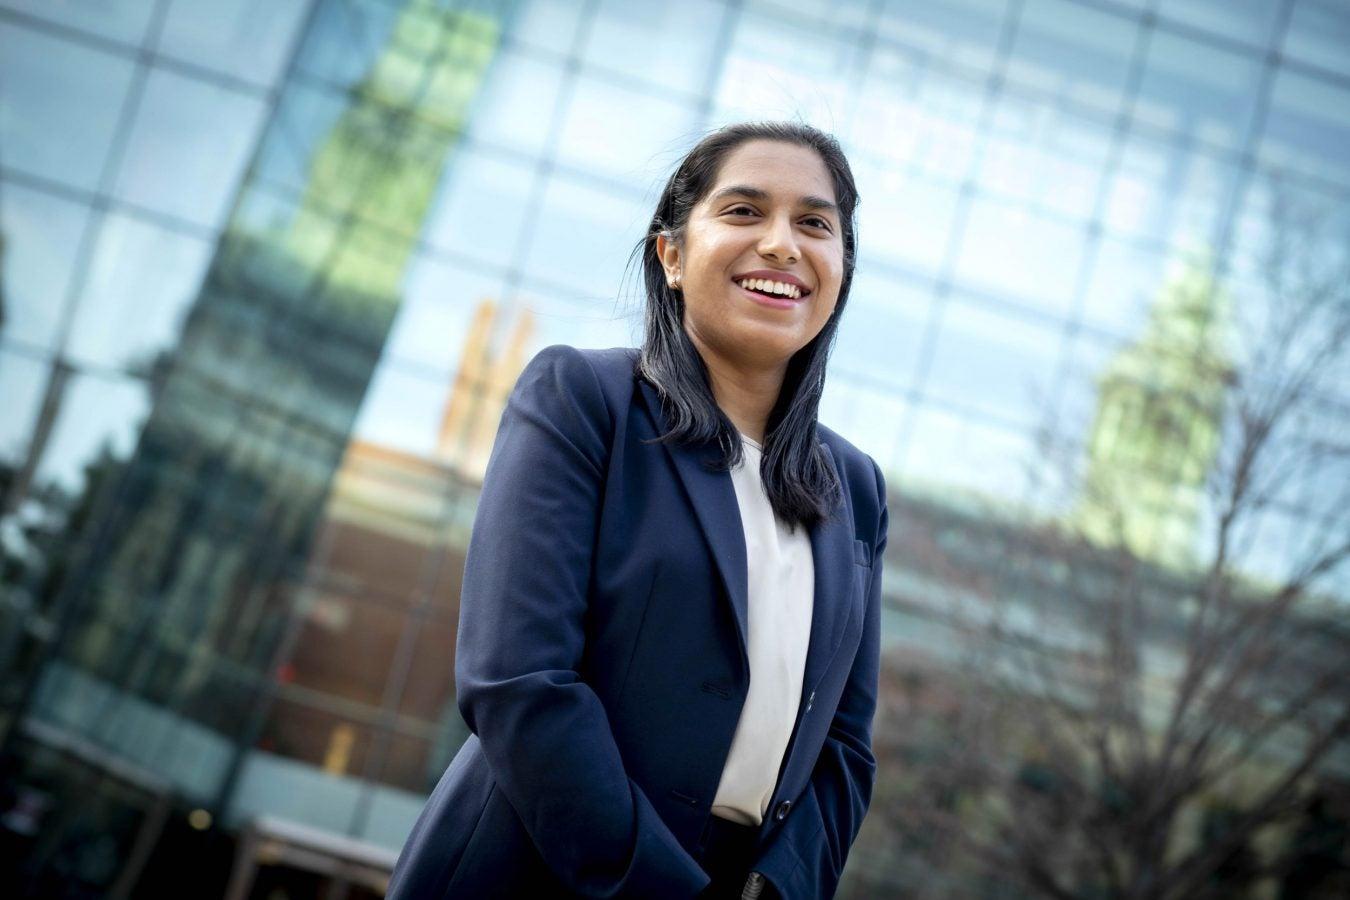 Harvard University Medical School student Pooja Chandrashekar is pictured.